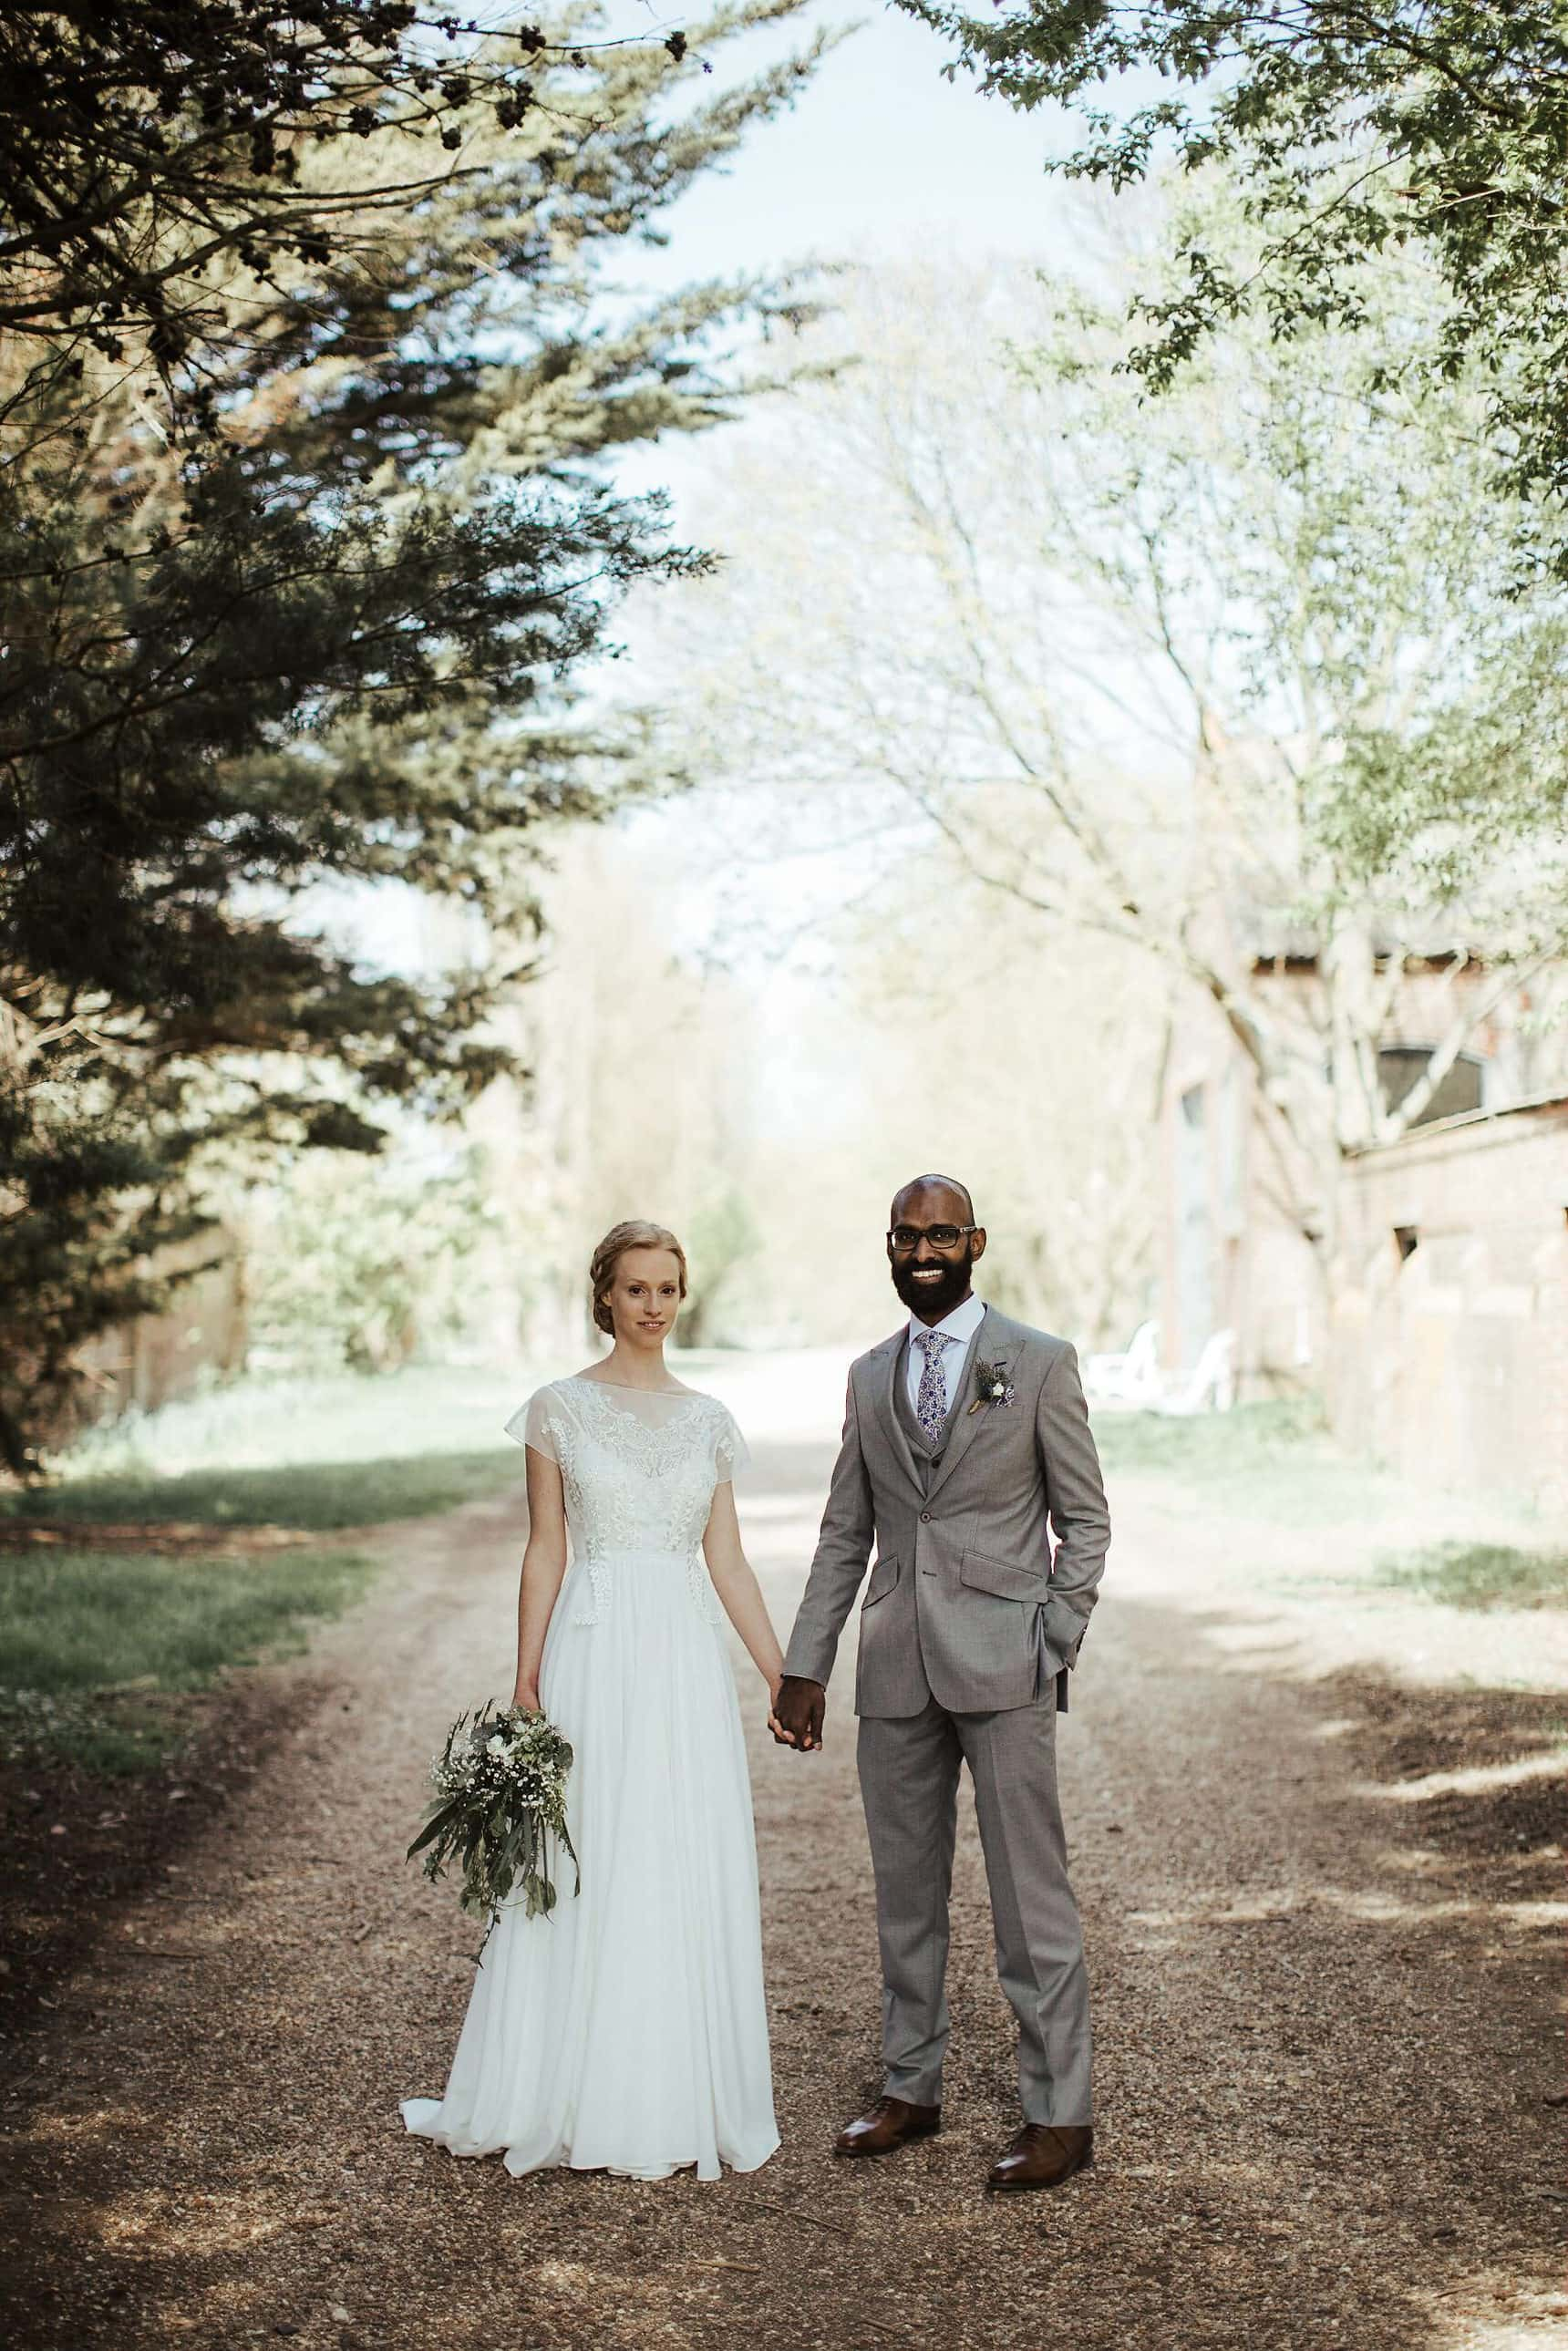 wedding portraits osea island essex